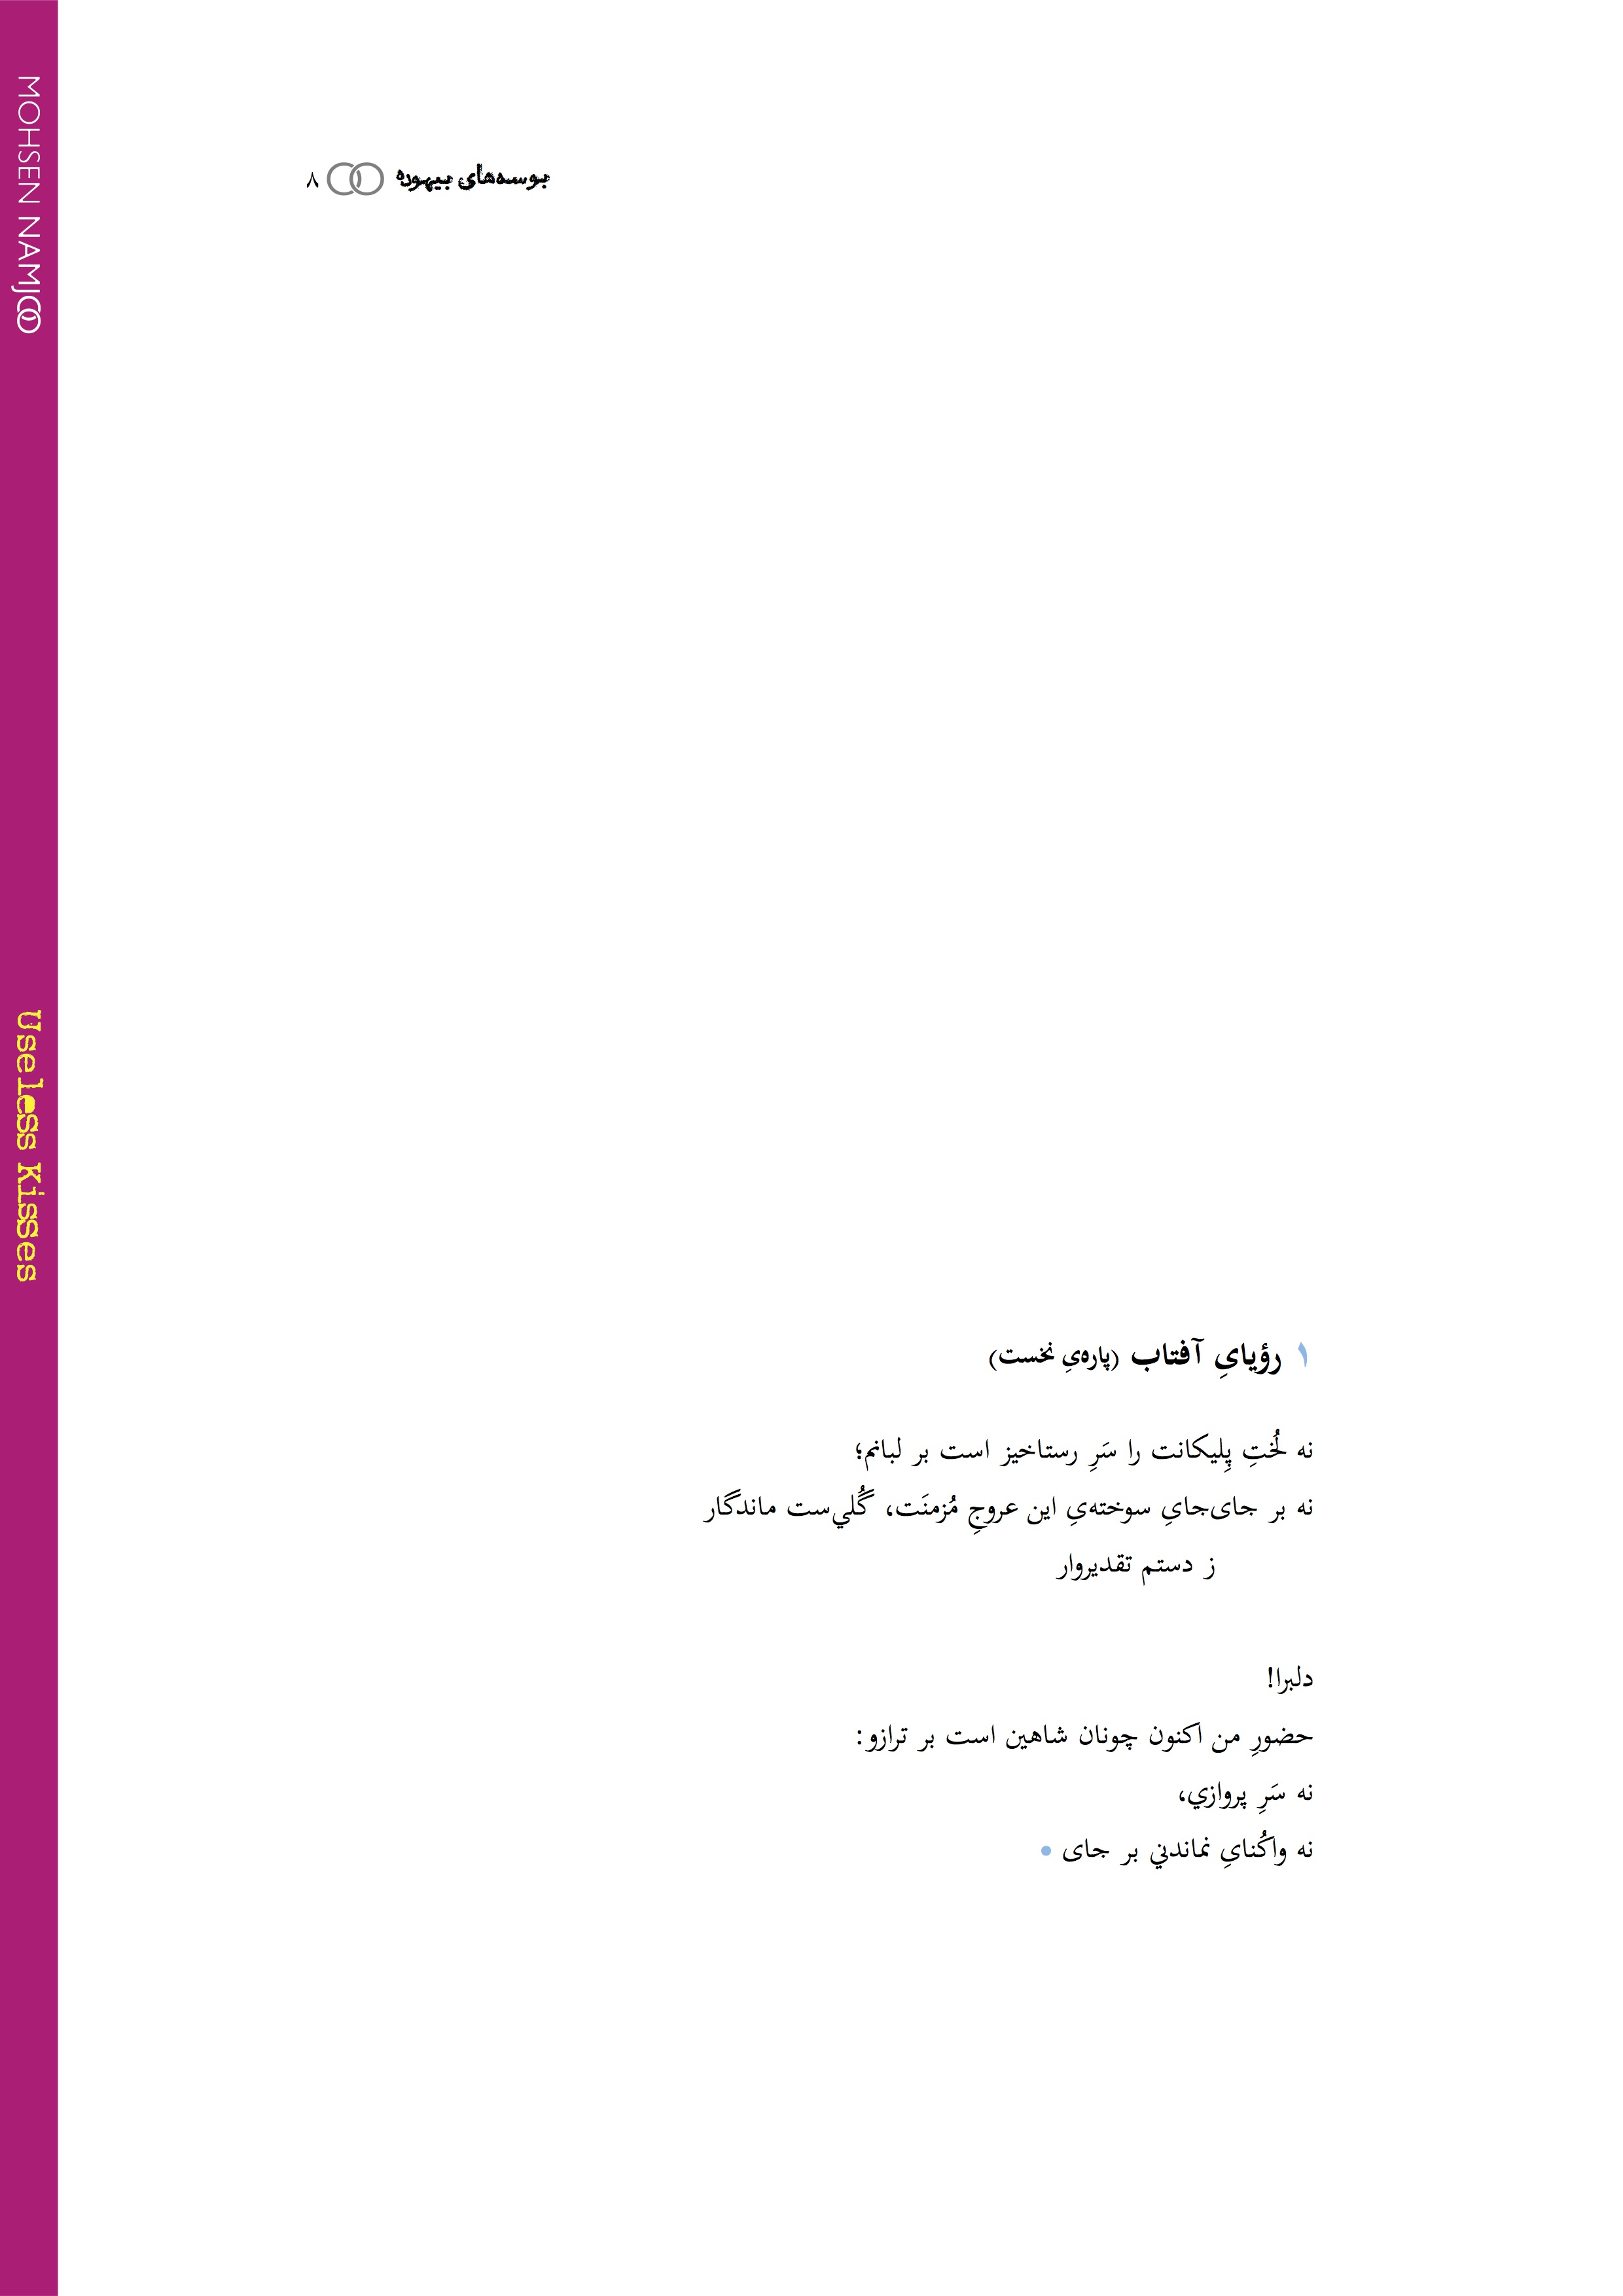 7Useless Kisses eBook (2nd Edition).jpg